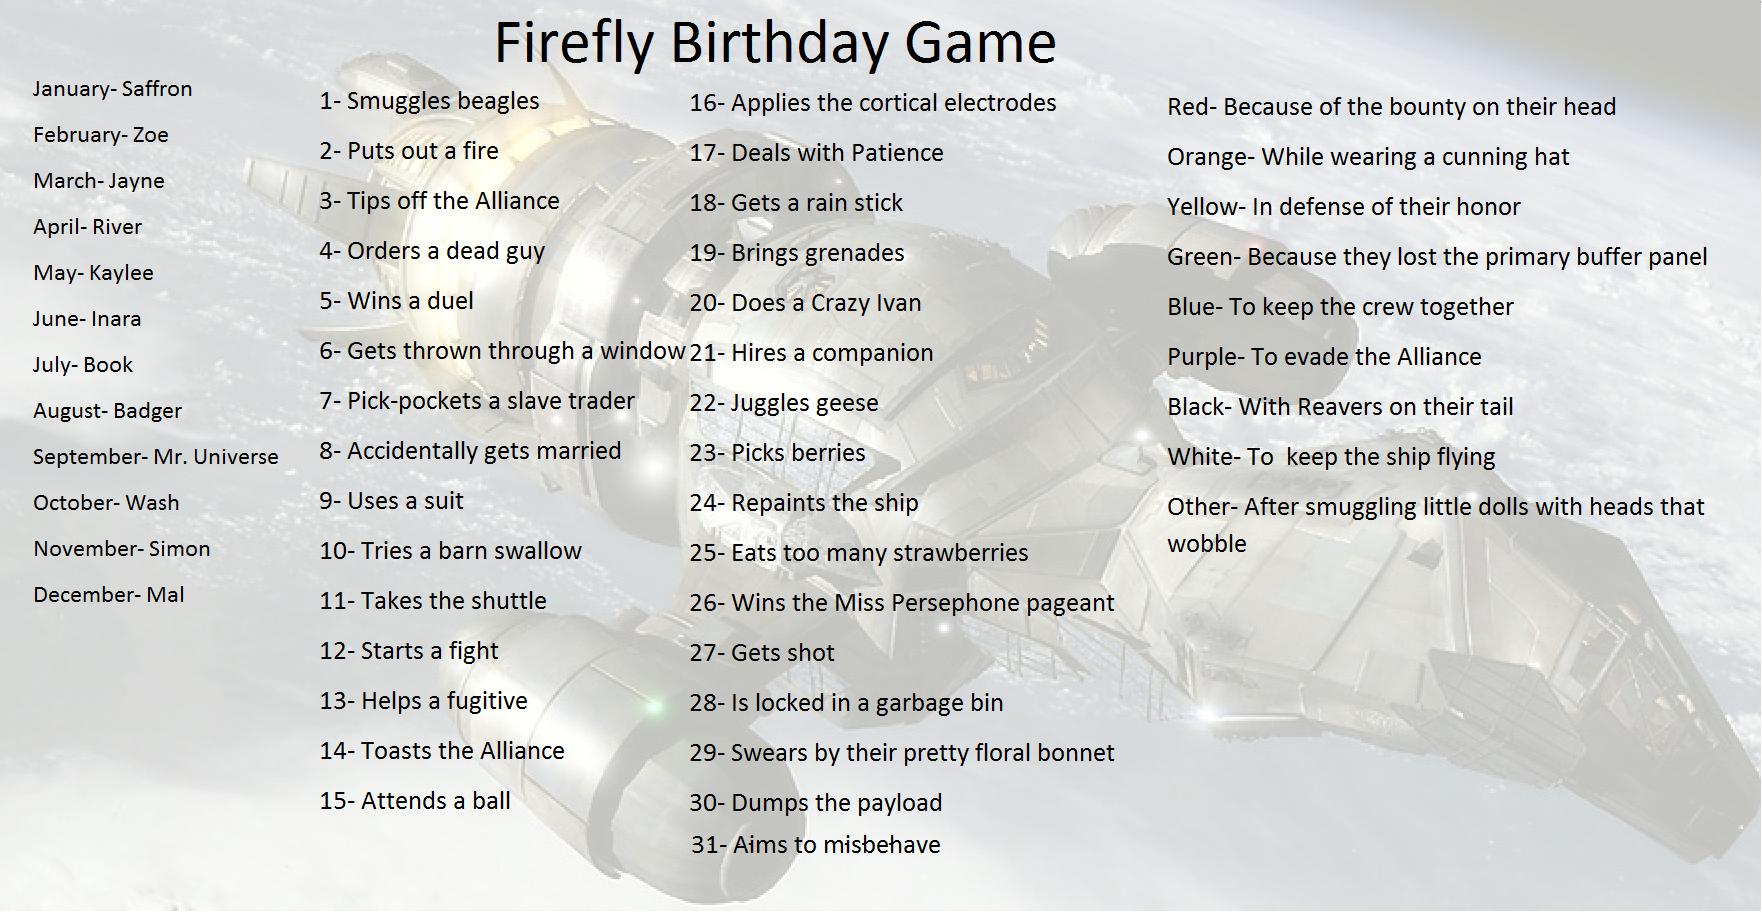 Firefly birthday game by FlyingGuineaPig on DeviantArt